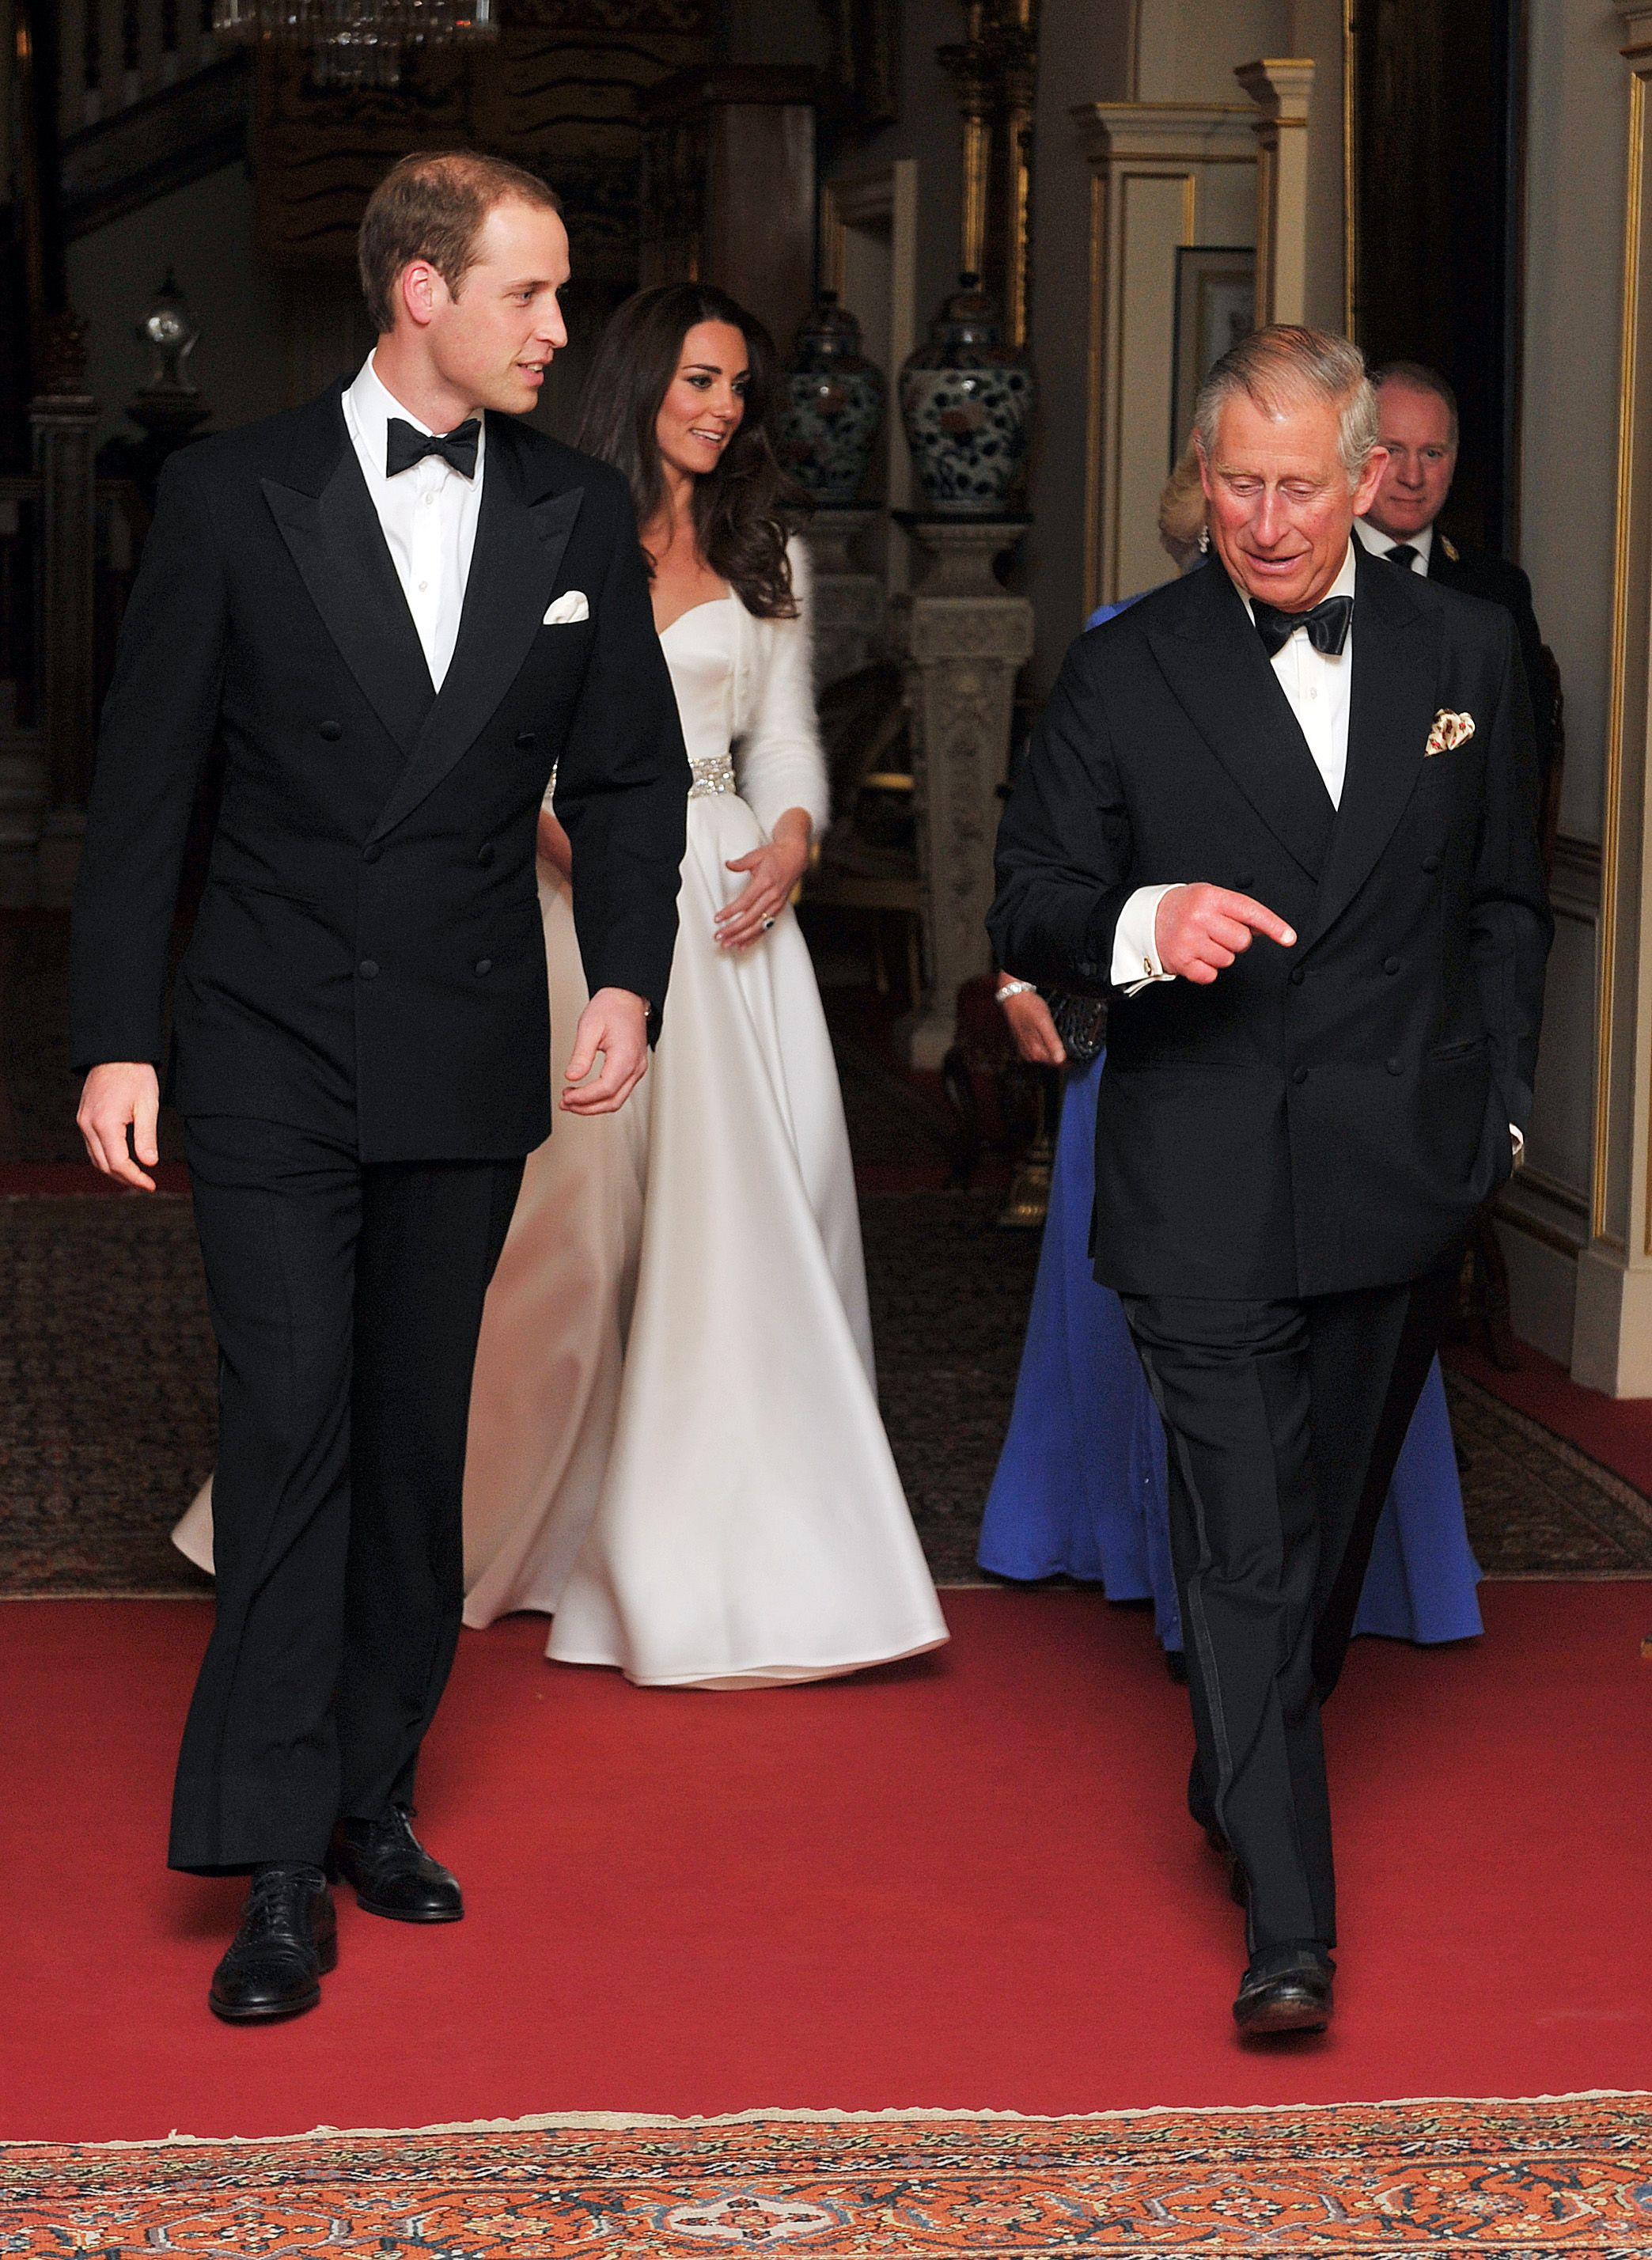 Kate Middleton Prince William Wedding Photos - Royal Wedding 2011 ...